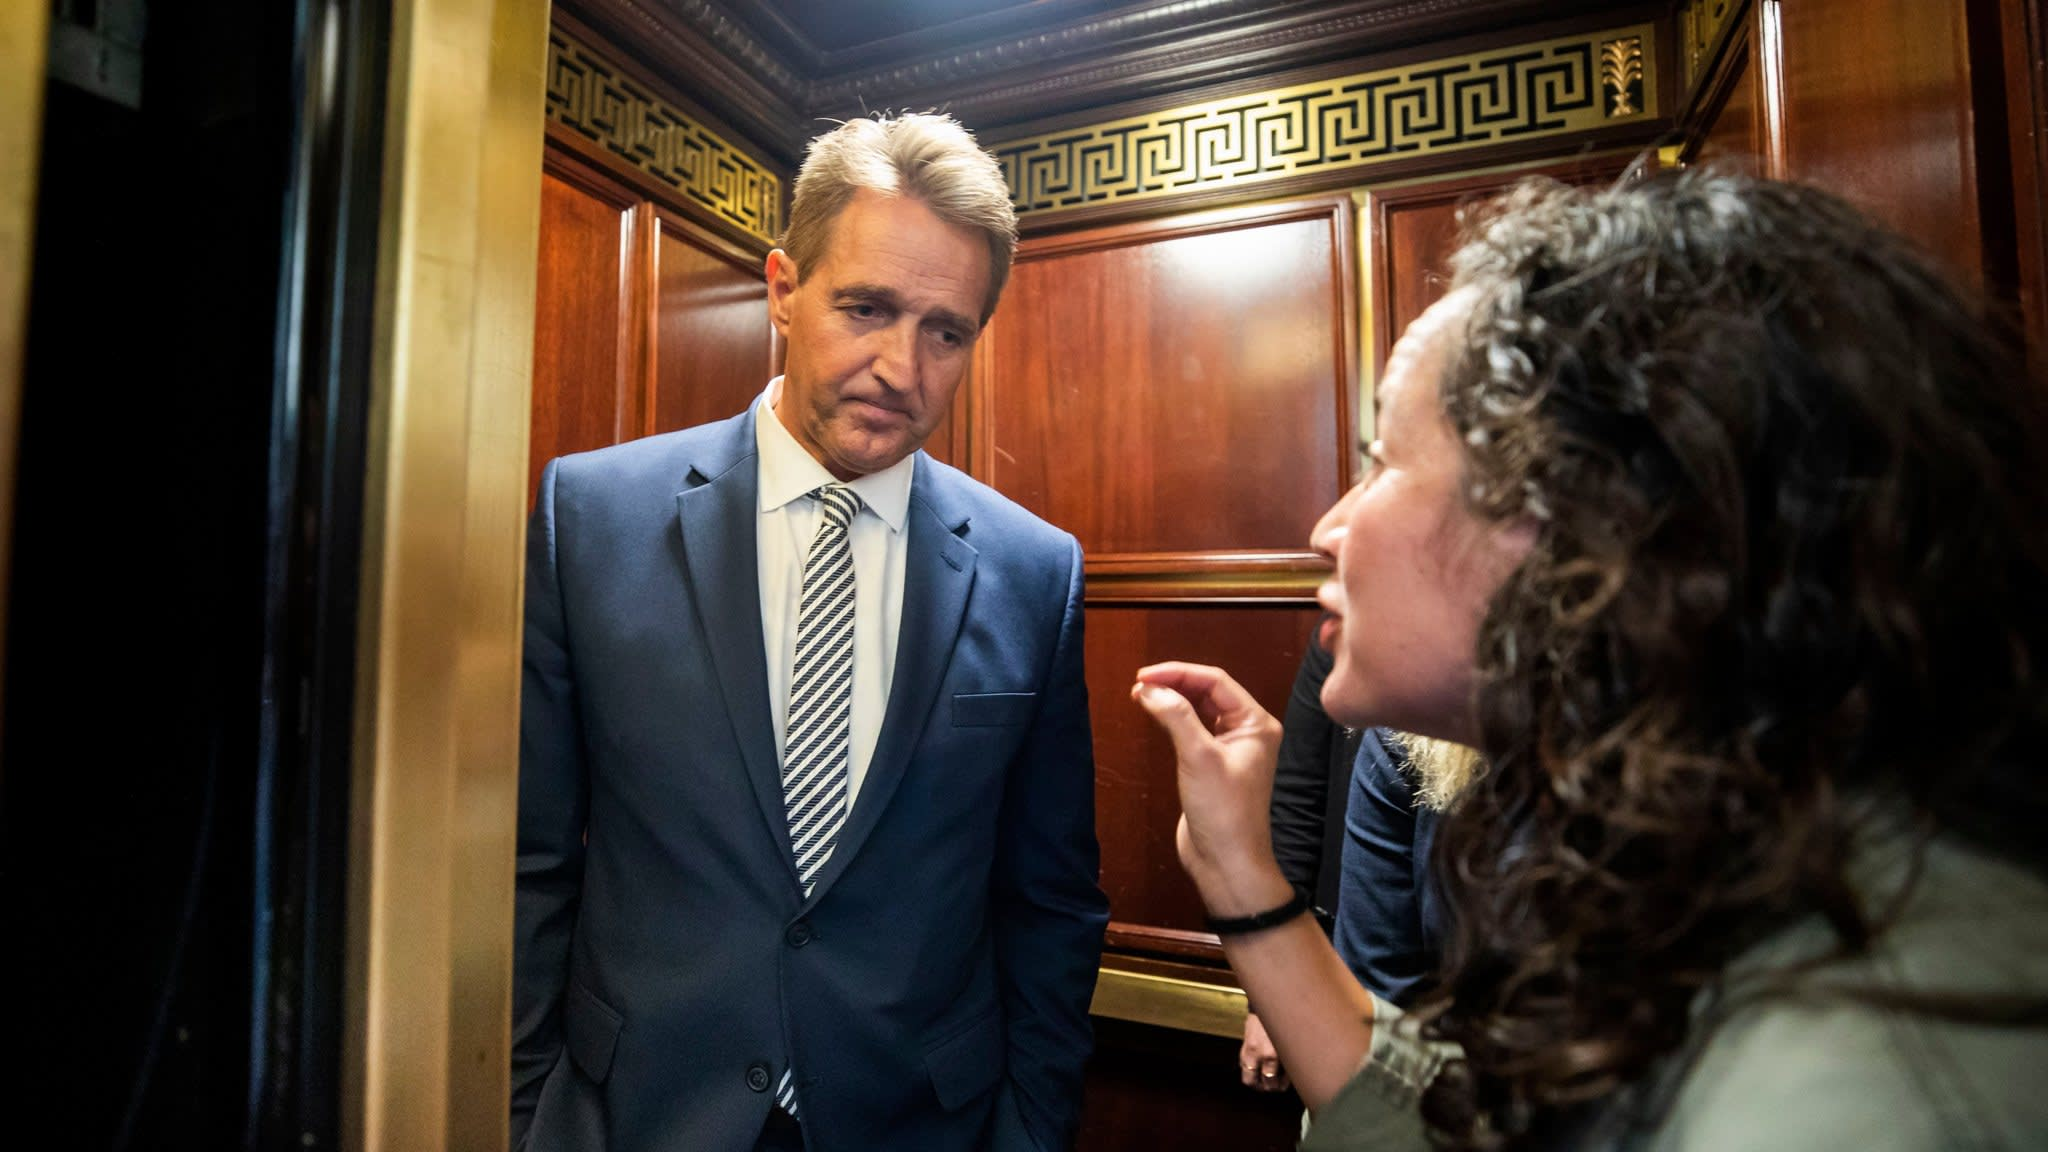 Senate committee backs Kavanaugh for Supreme Court